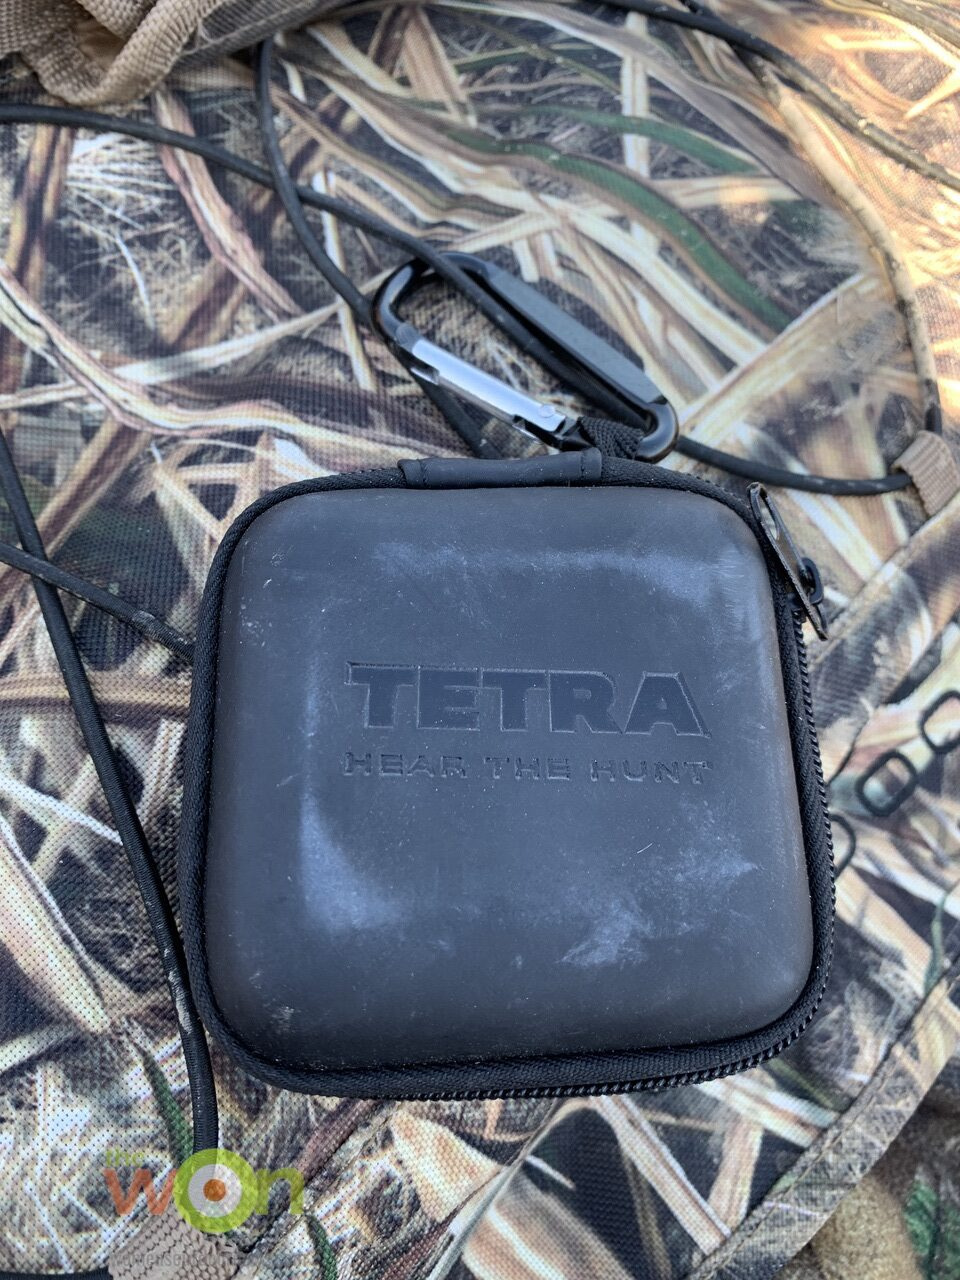 TETRA soft case